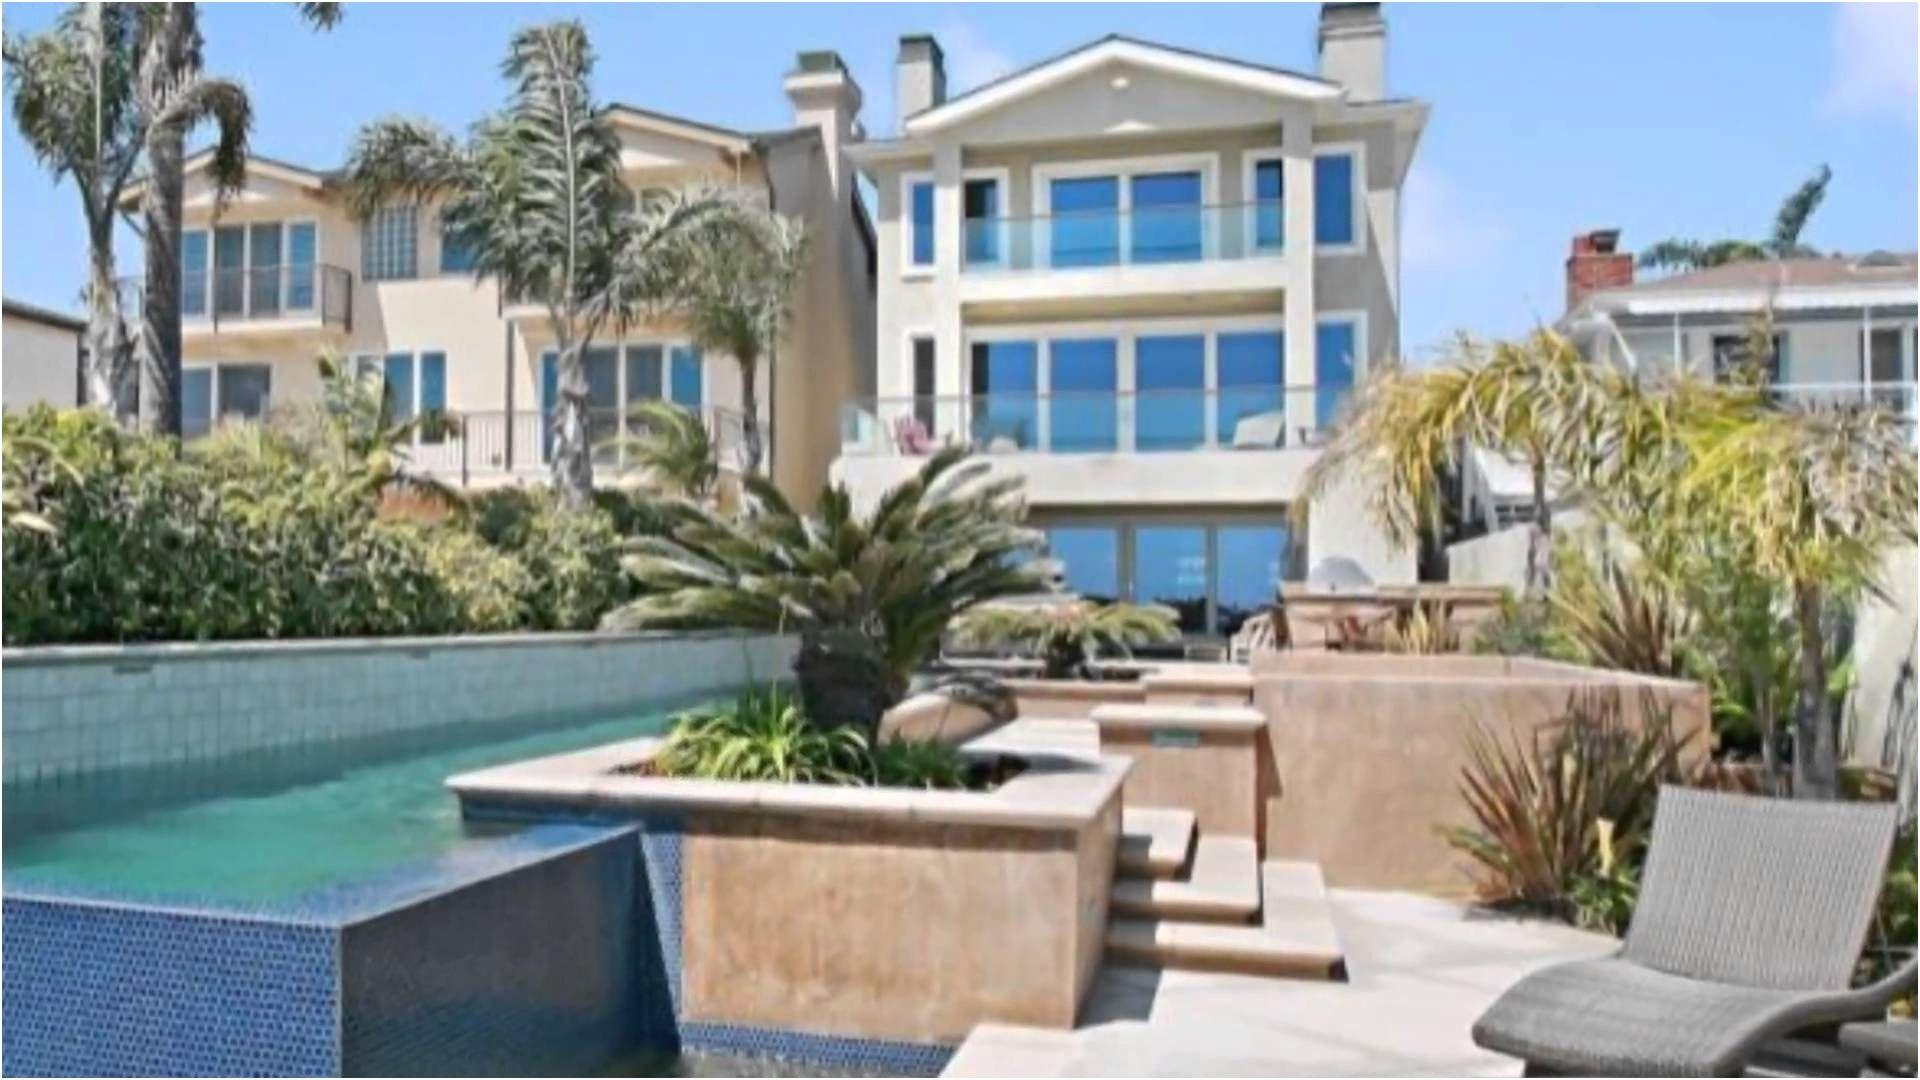 Orange County Homes For Sale 546 Ocean Ave Seal Beach Ca 2 Youtube From Huntington Beach Beach House Rentals